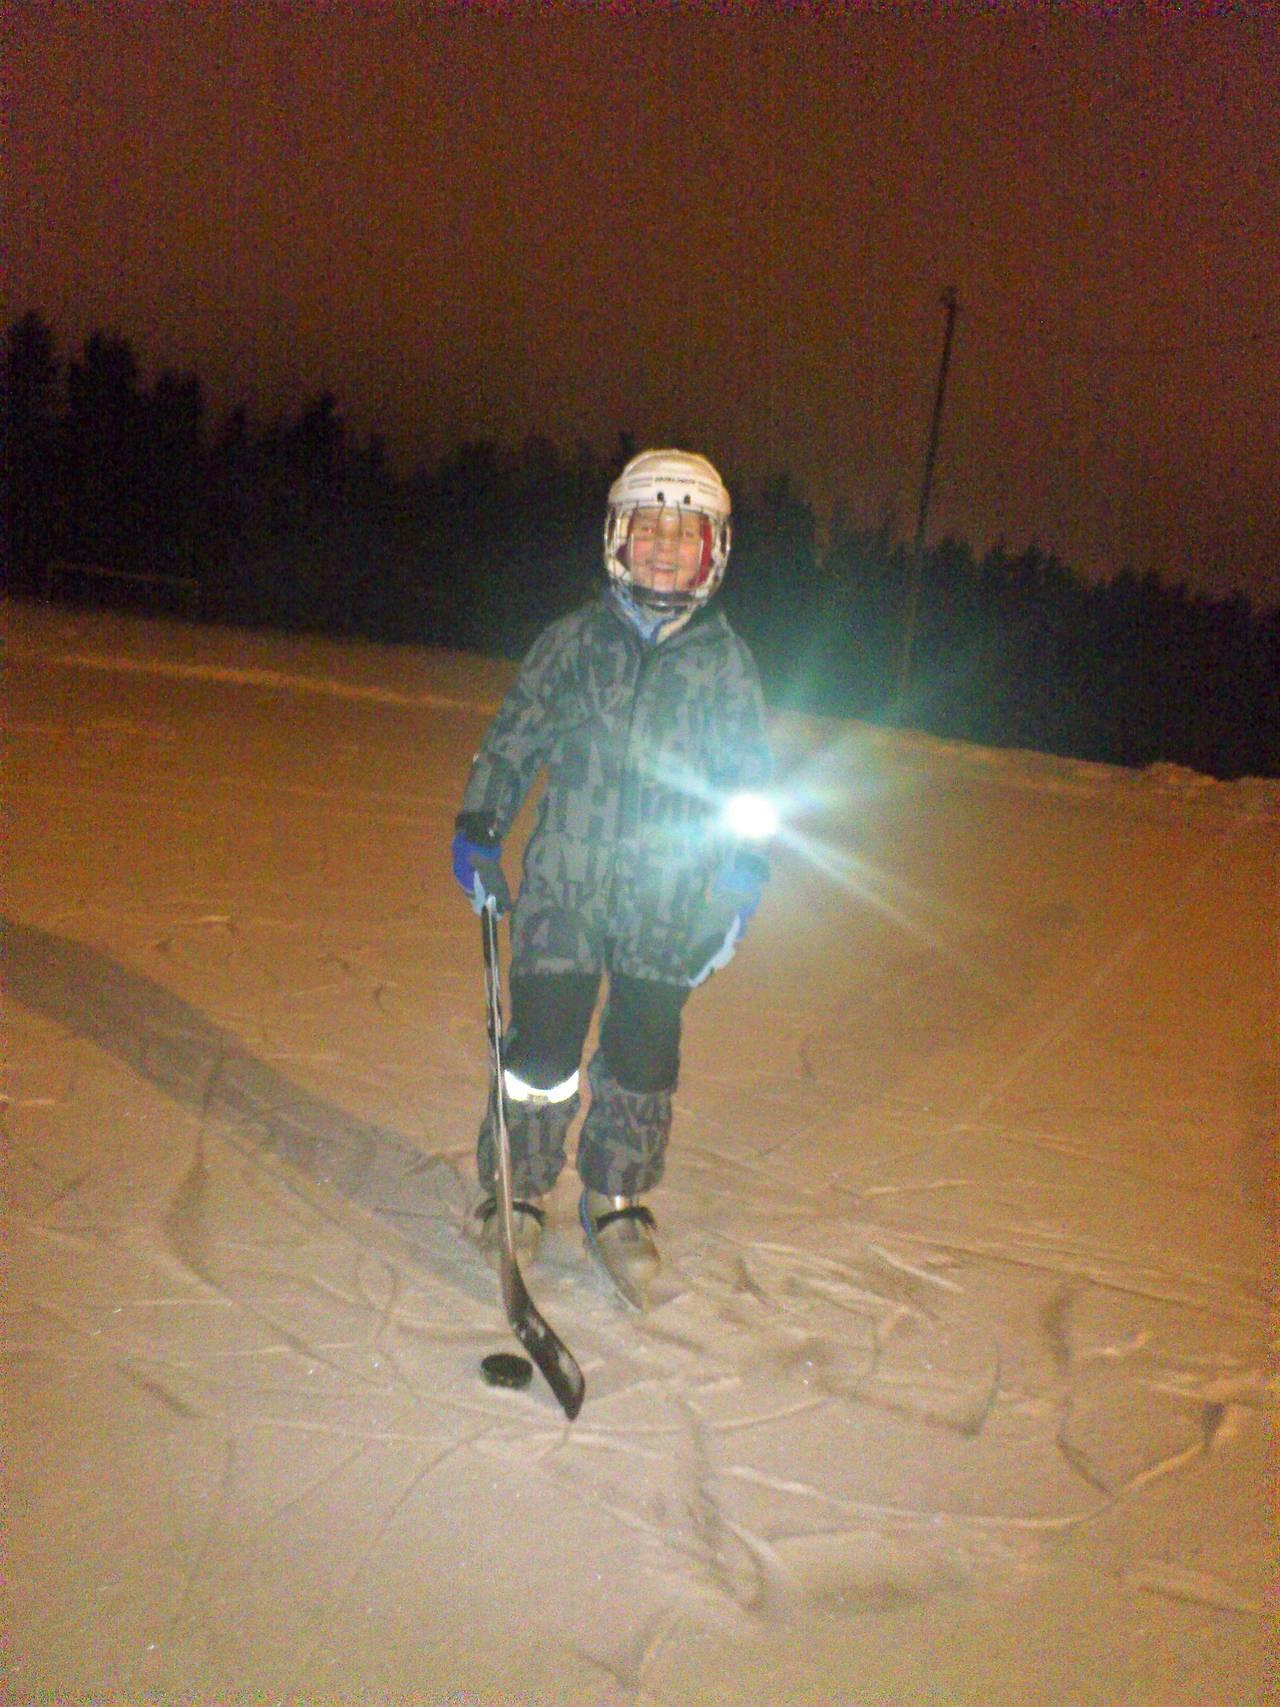 Joakim Visnes, hockey